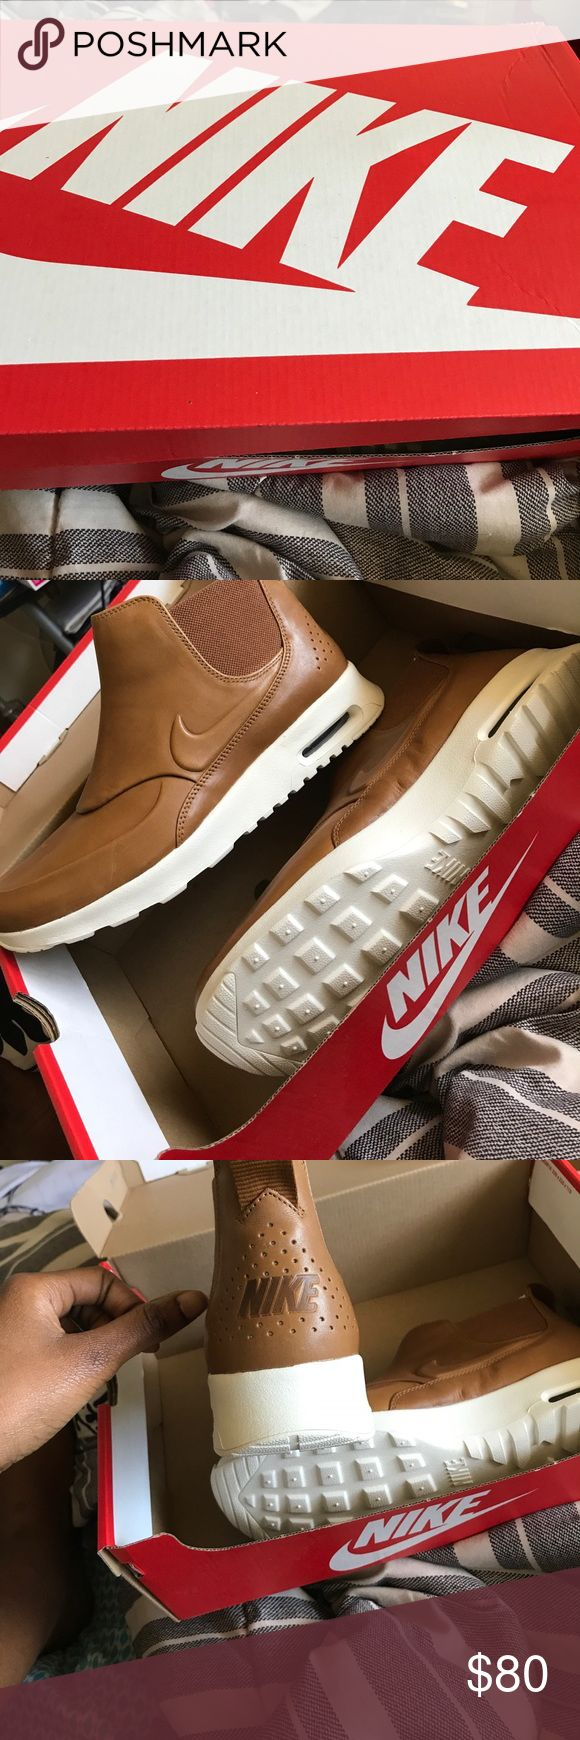 Brand New NIKE shoe Nike shoe brand new in box  nike Shoes Sneakers